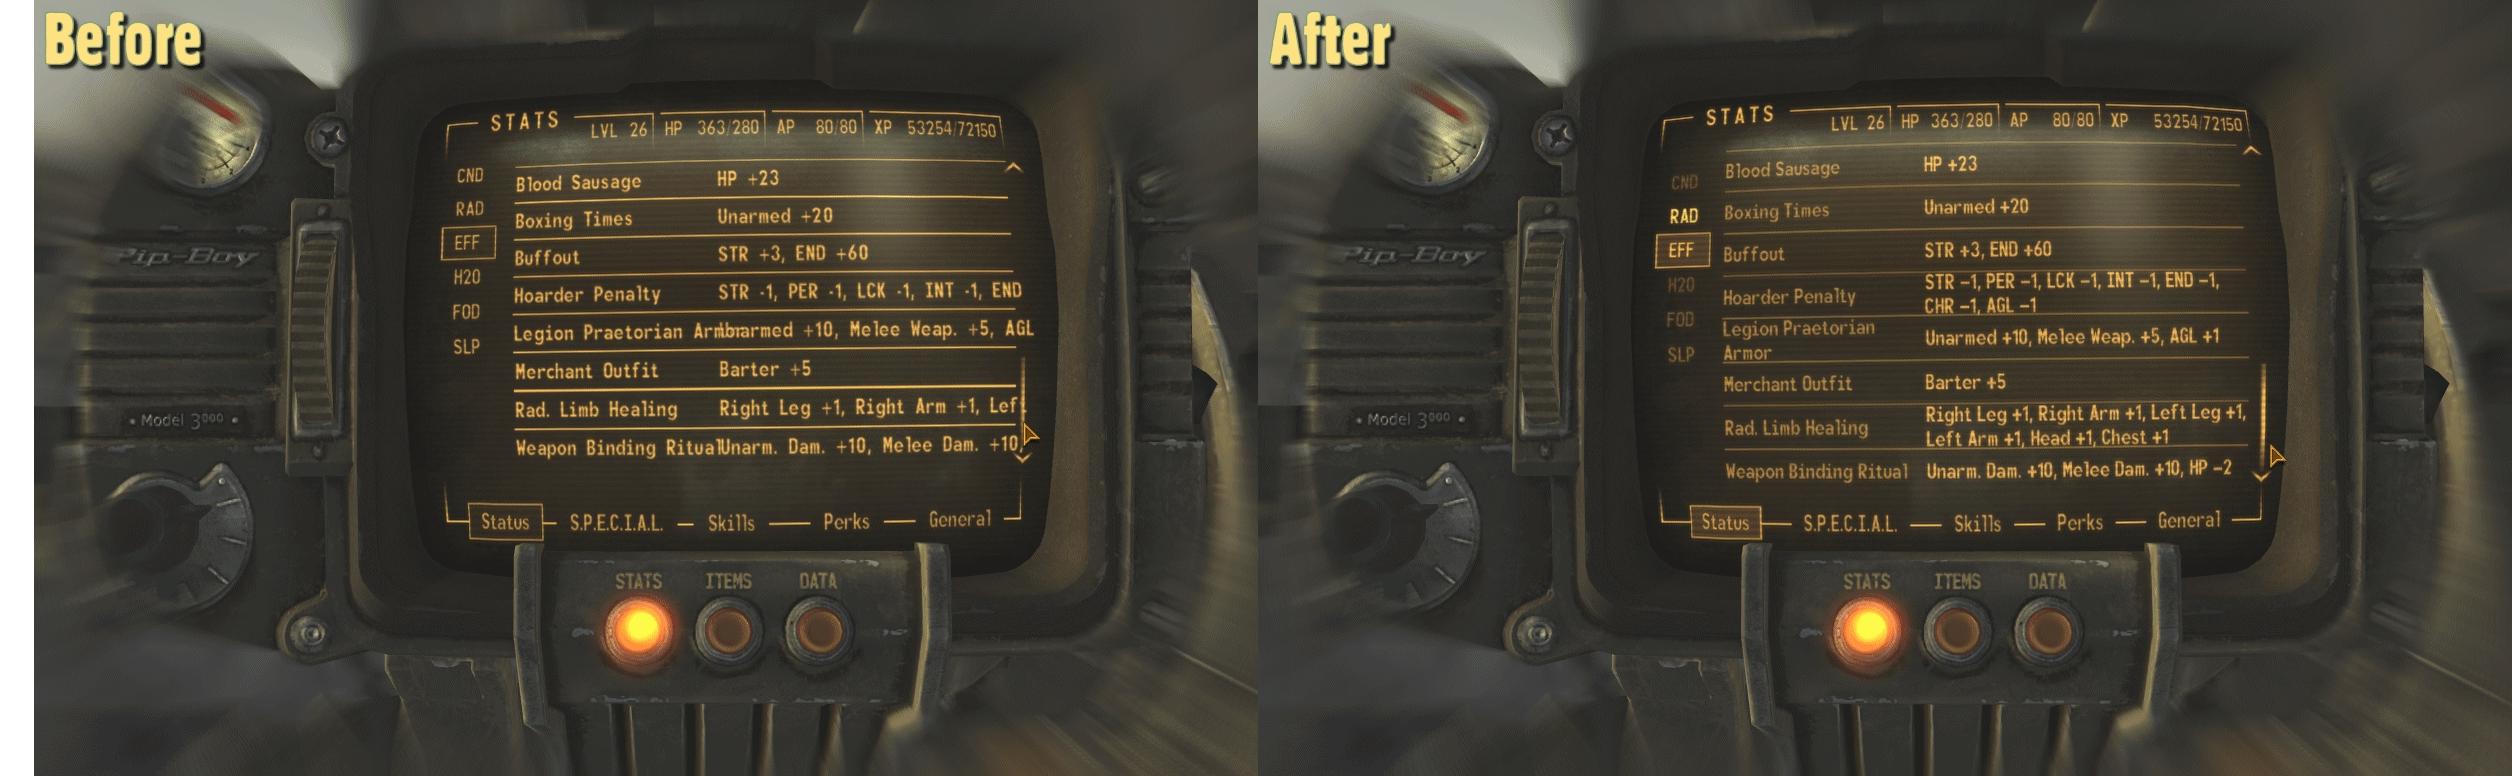 Image 7.png - Fallout: New Vegas